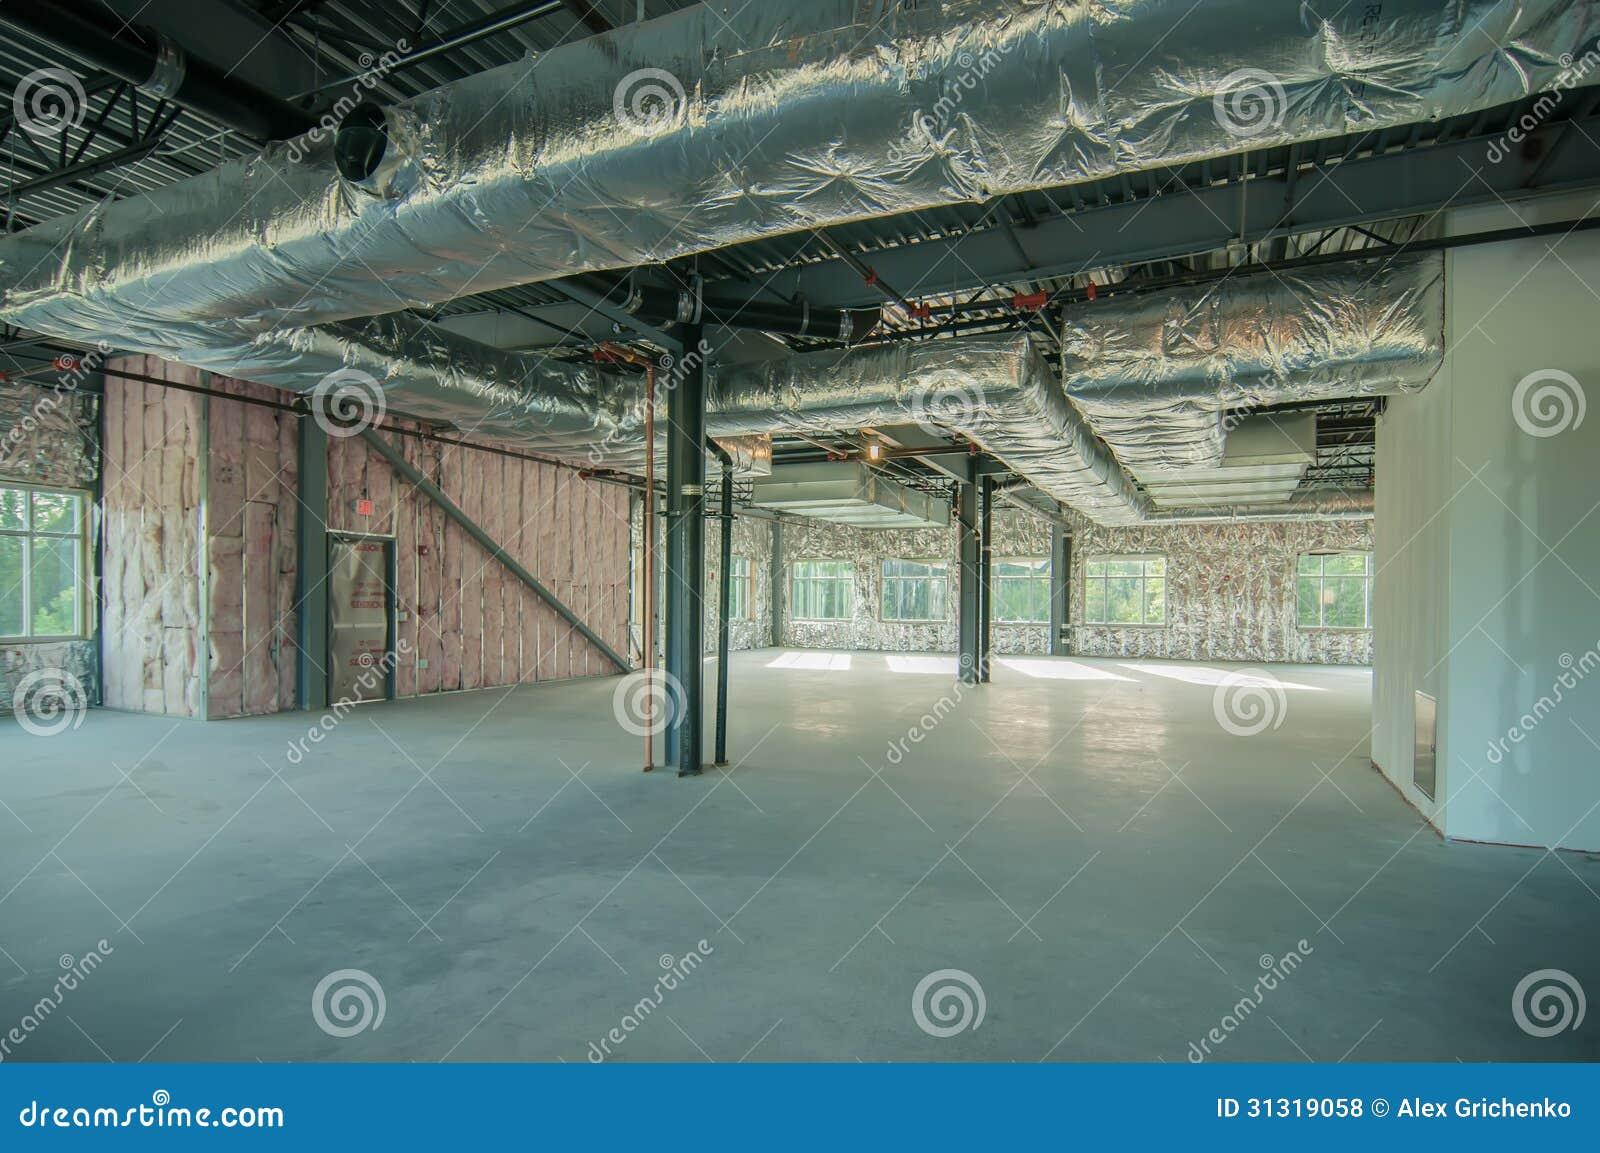 Stahlskelettbauprojekt Unfertig Stockfoto - Bild von aufbau ...